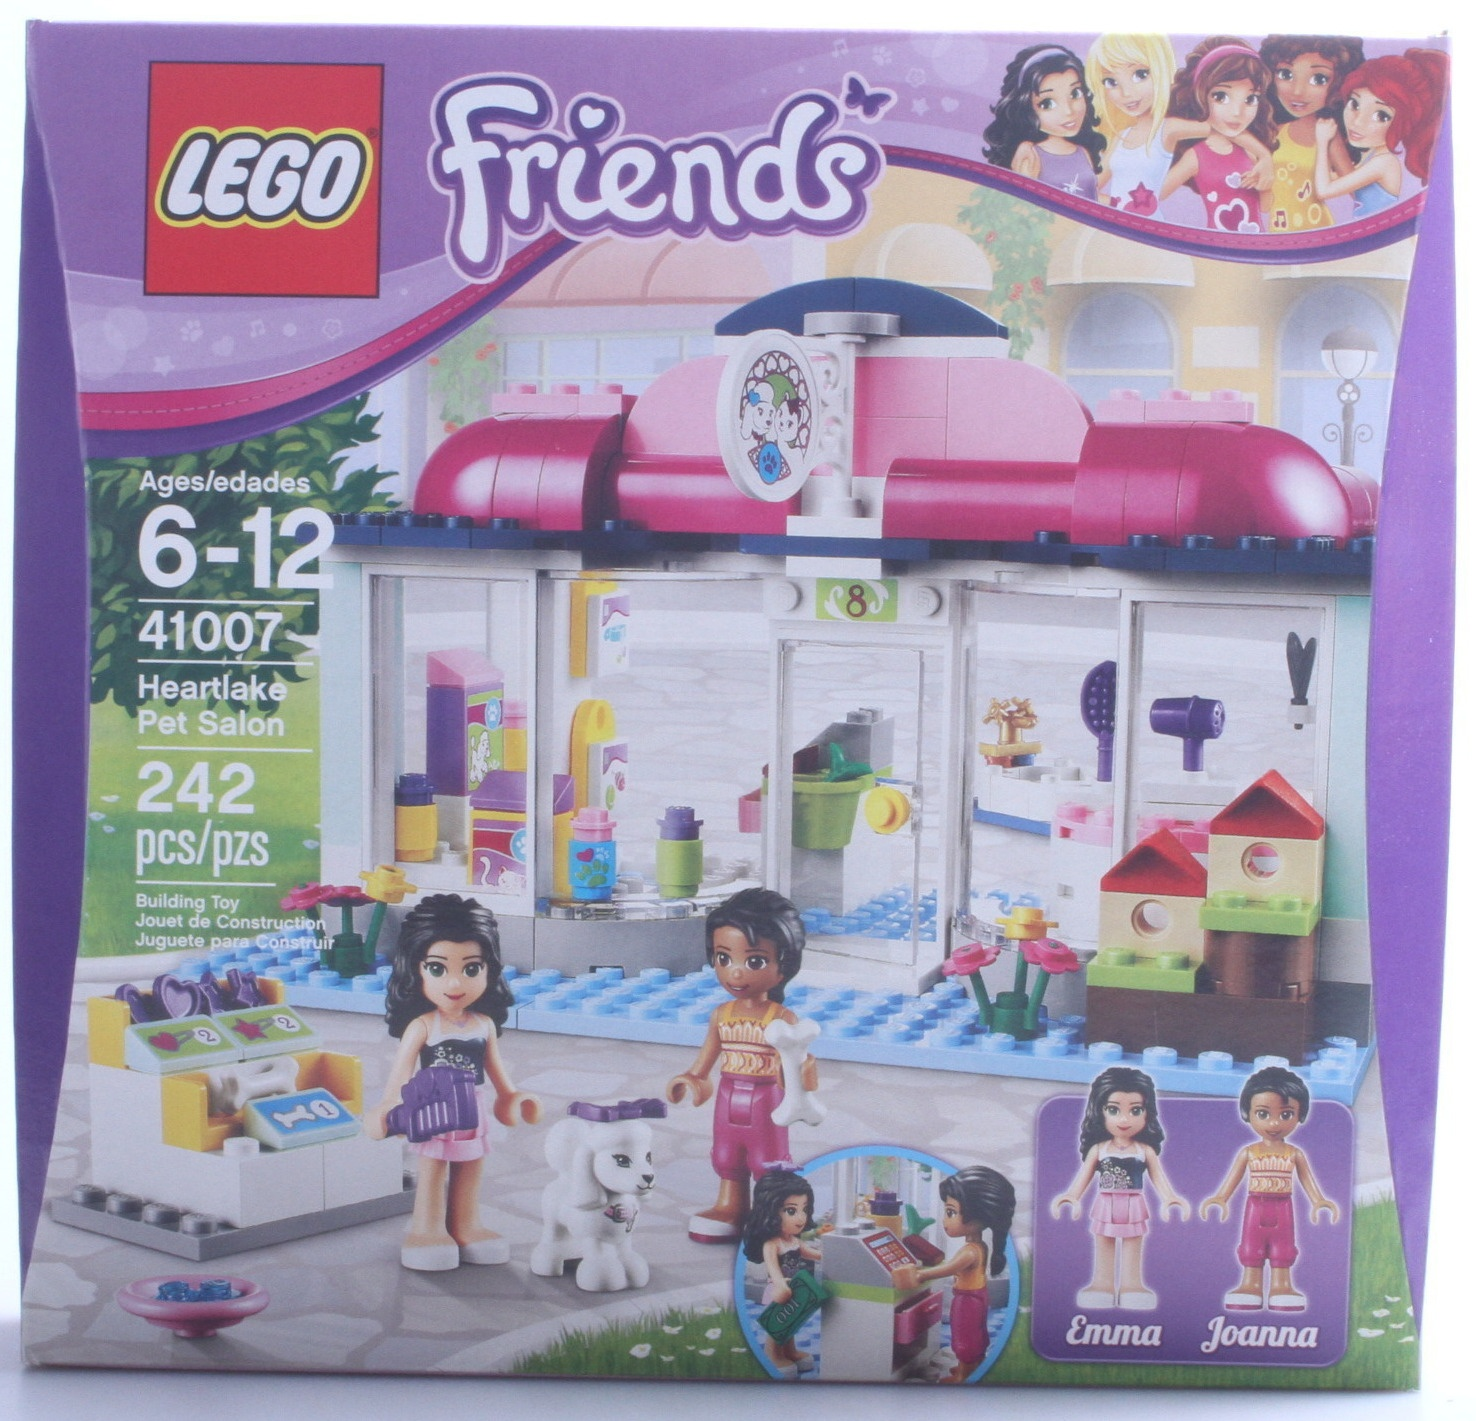 Friends Heartlake Salon Lego Friends Lego Pet Pet Heartlake bf76yIgmYv